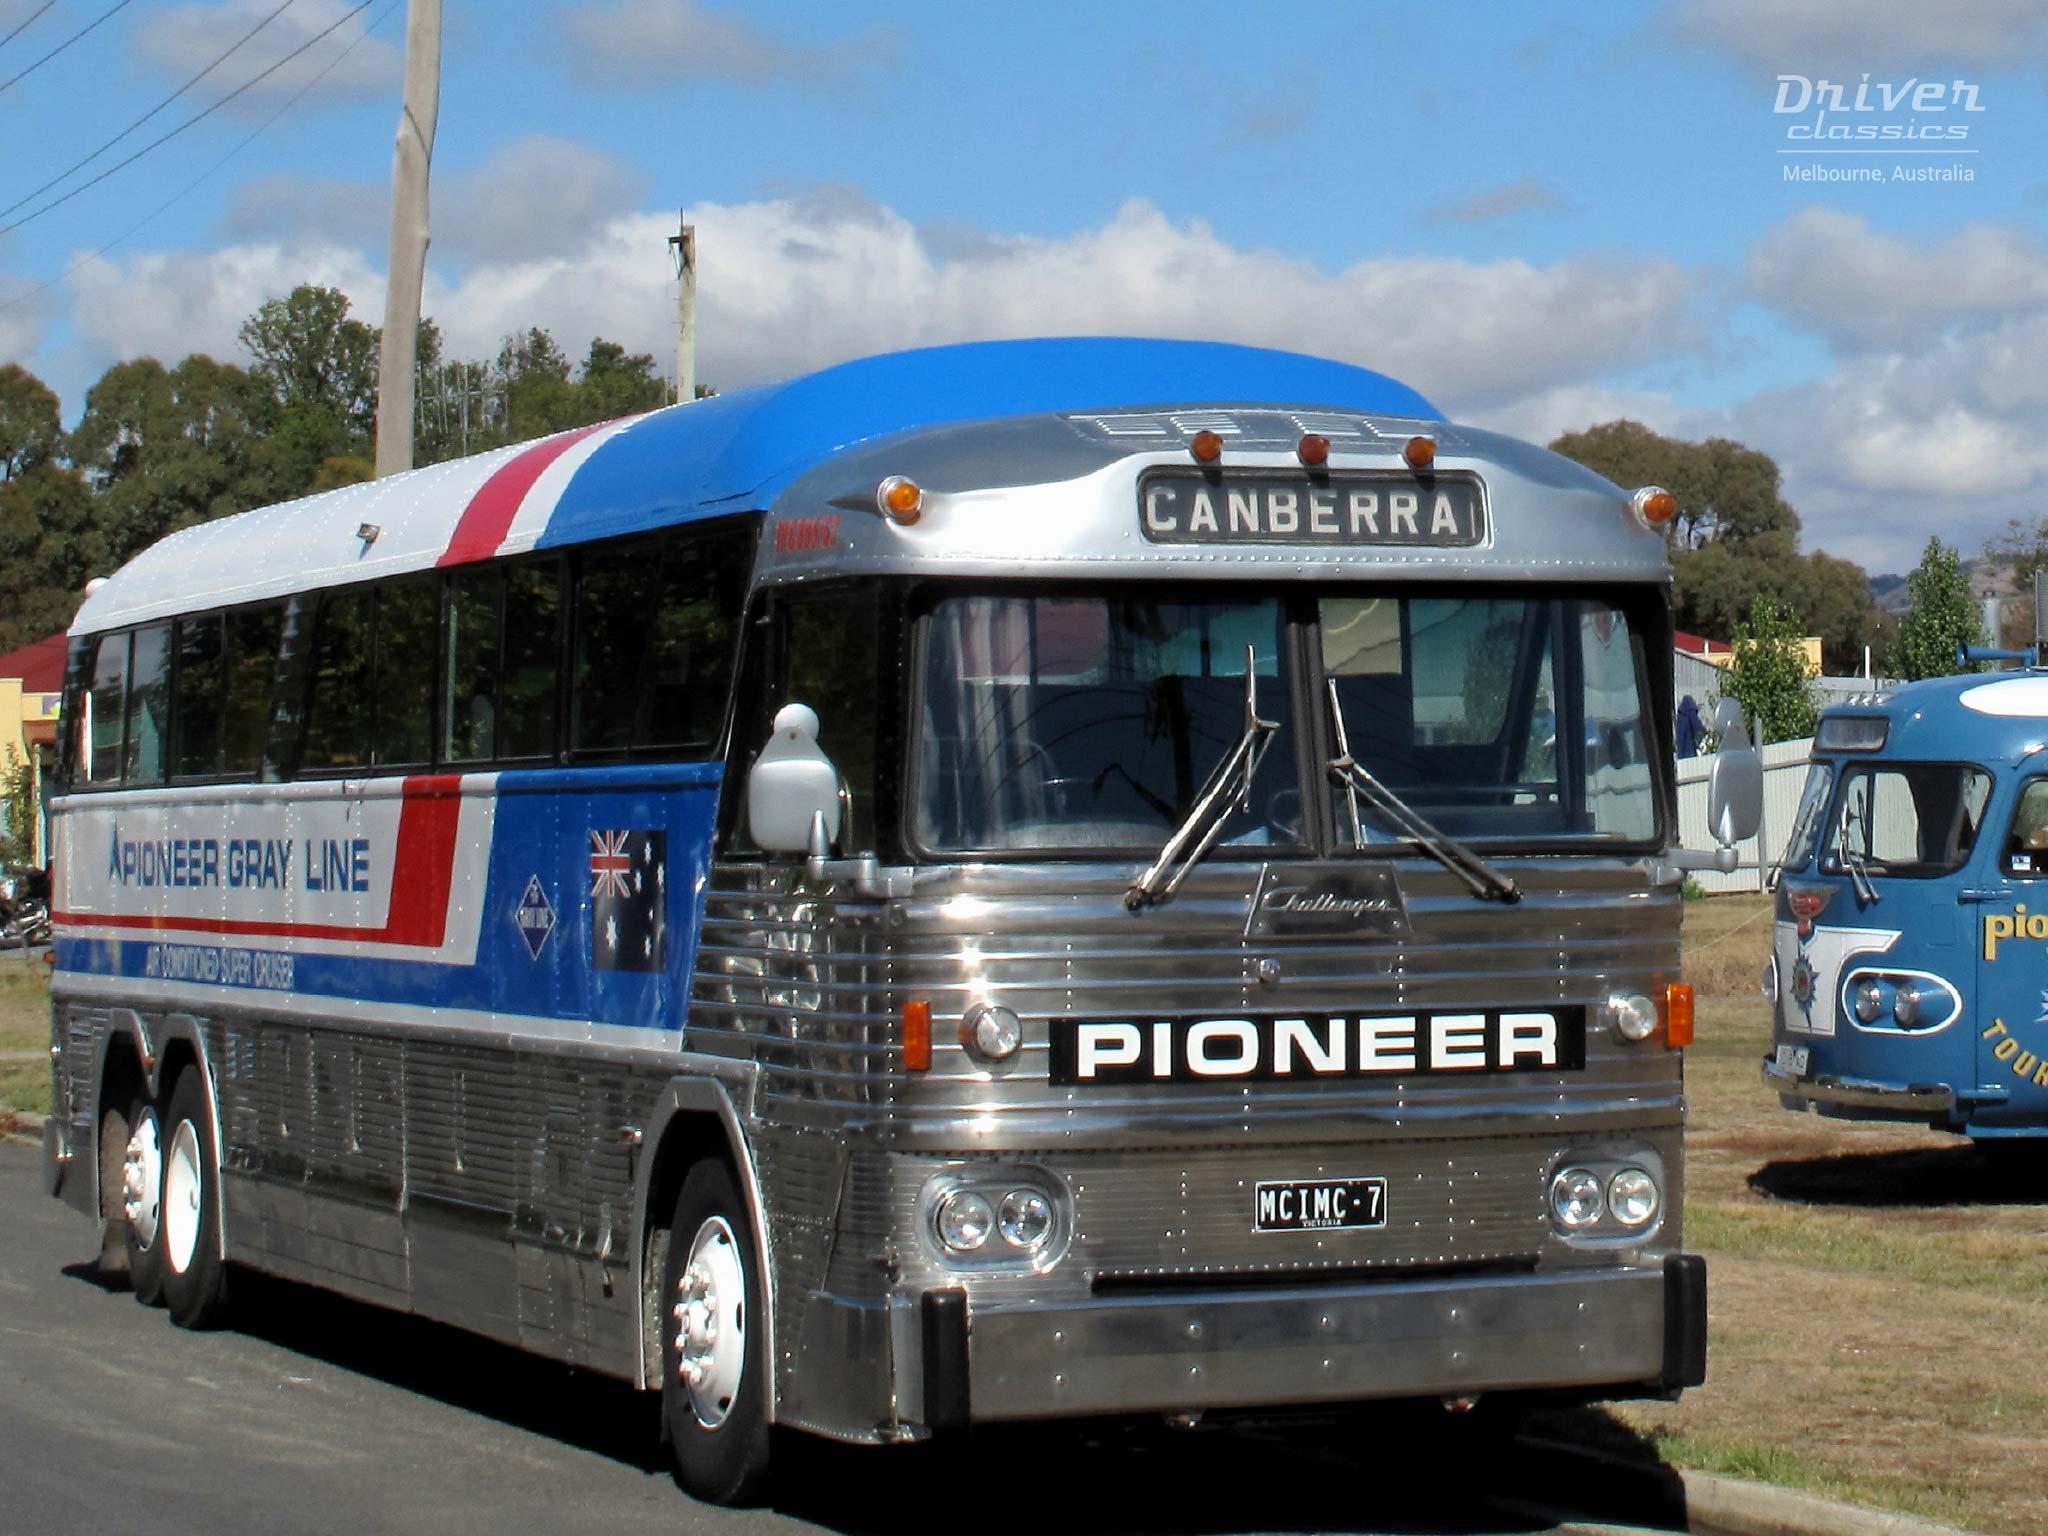 MCI MC7 bus